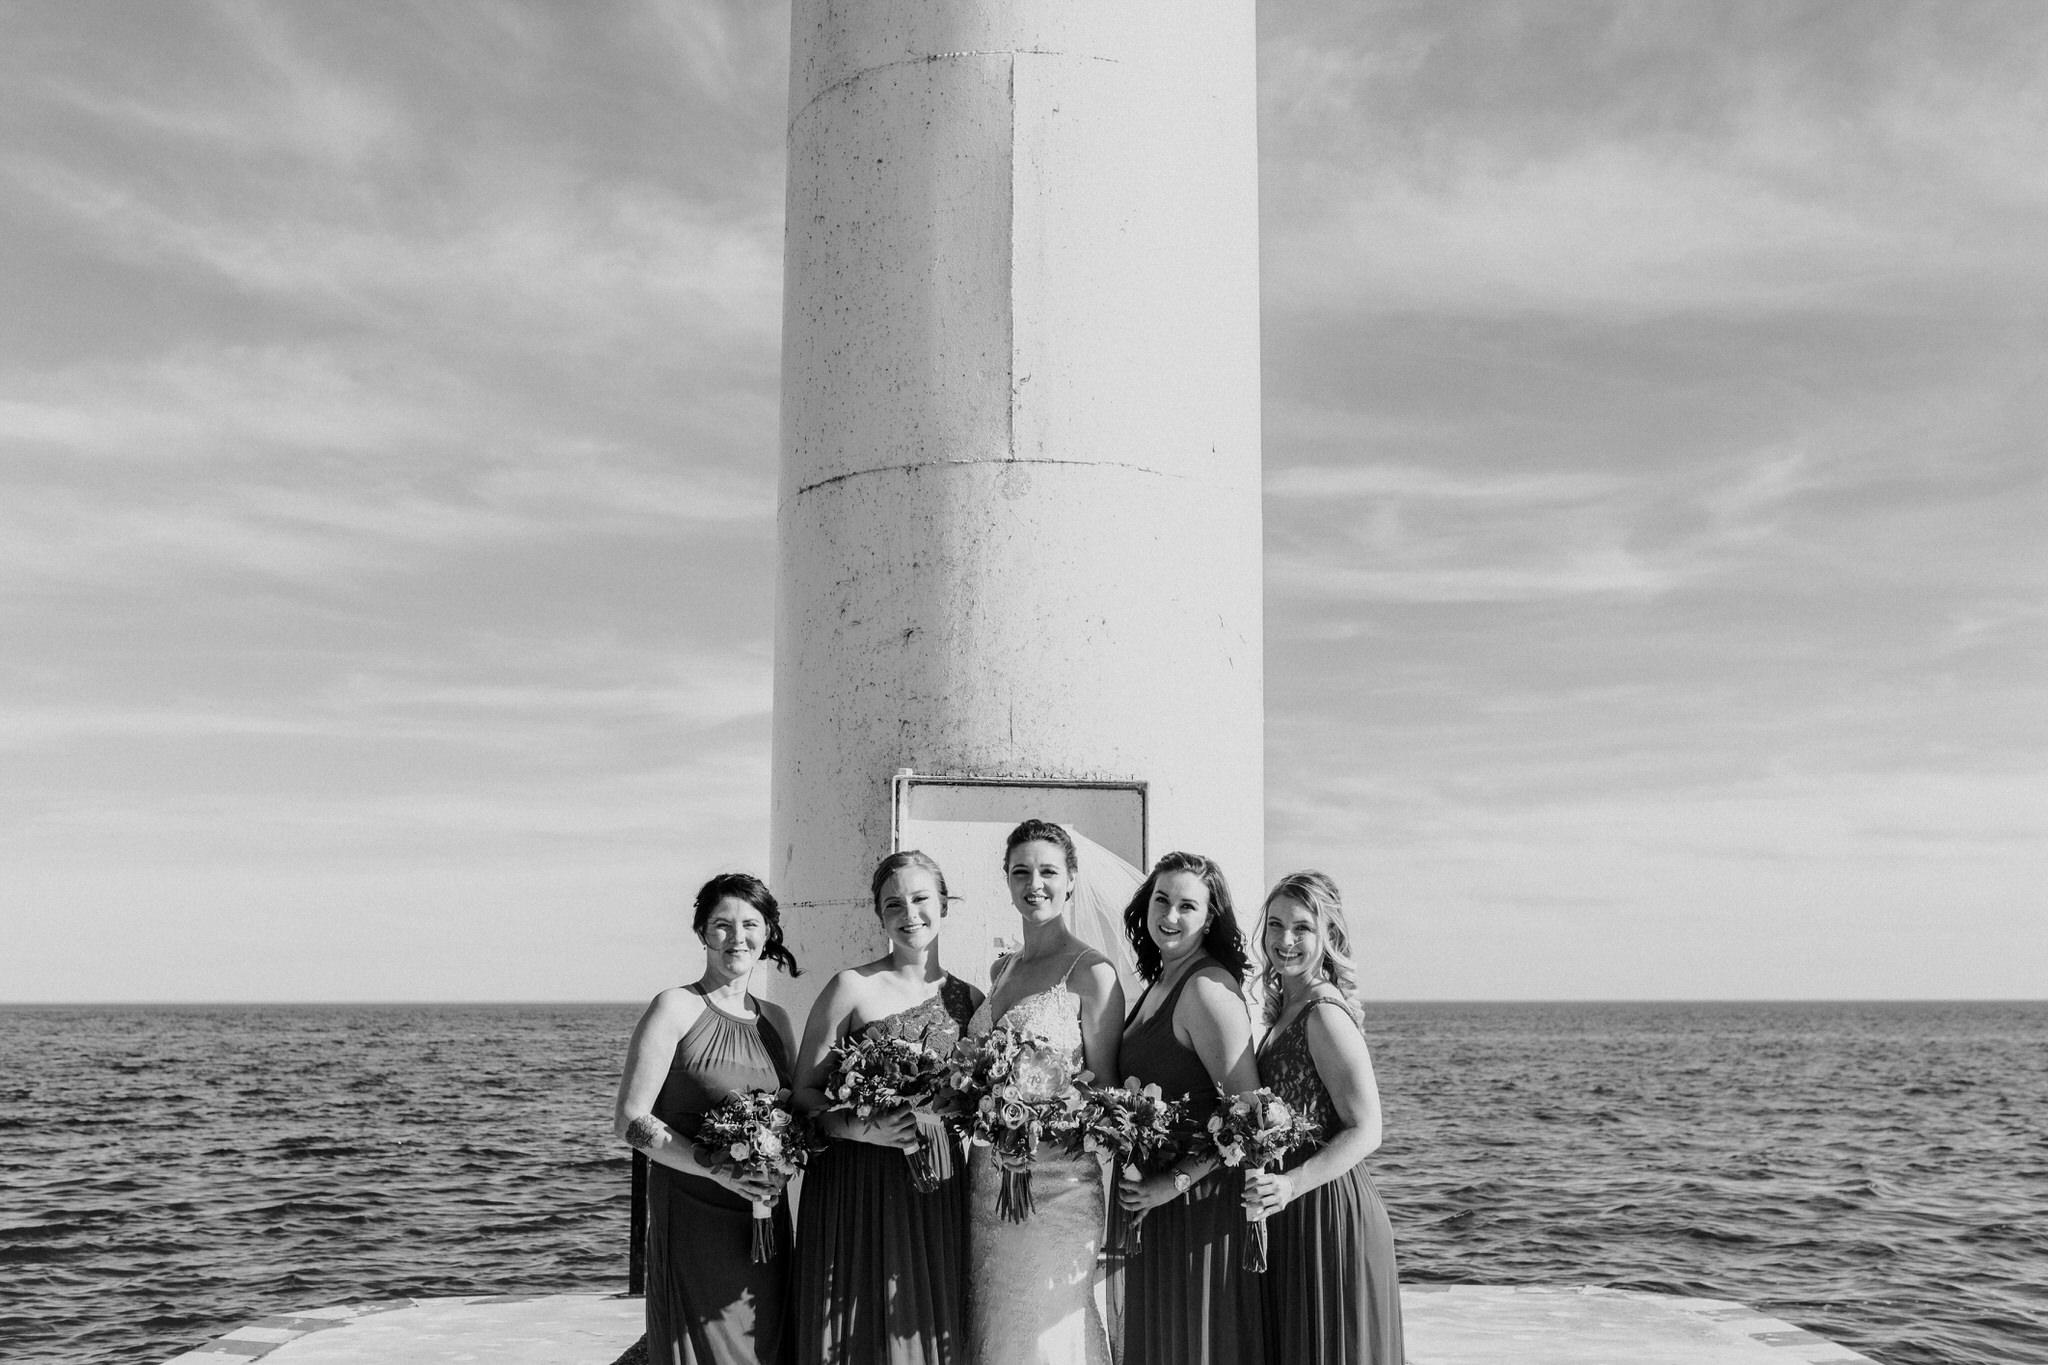 Brock Street Brewery Wedding - bridal party portrait